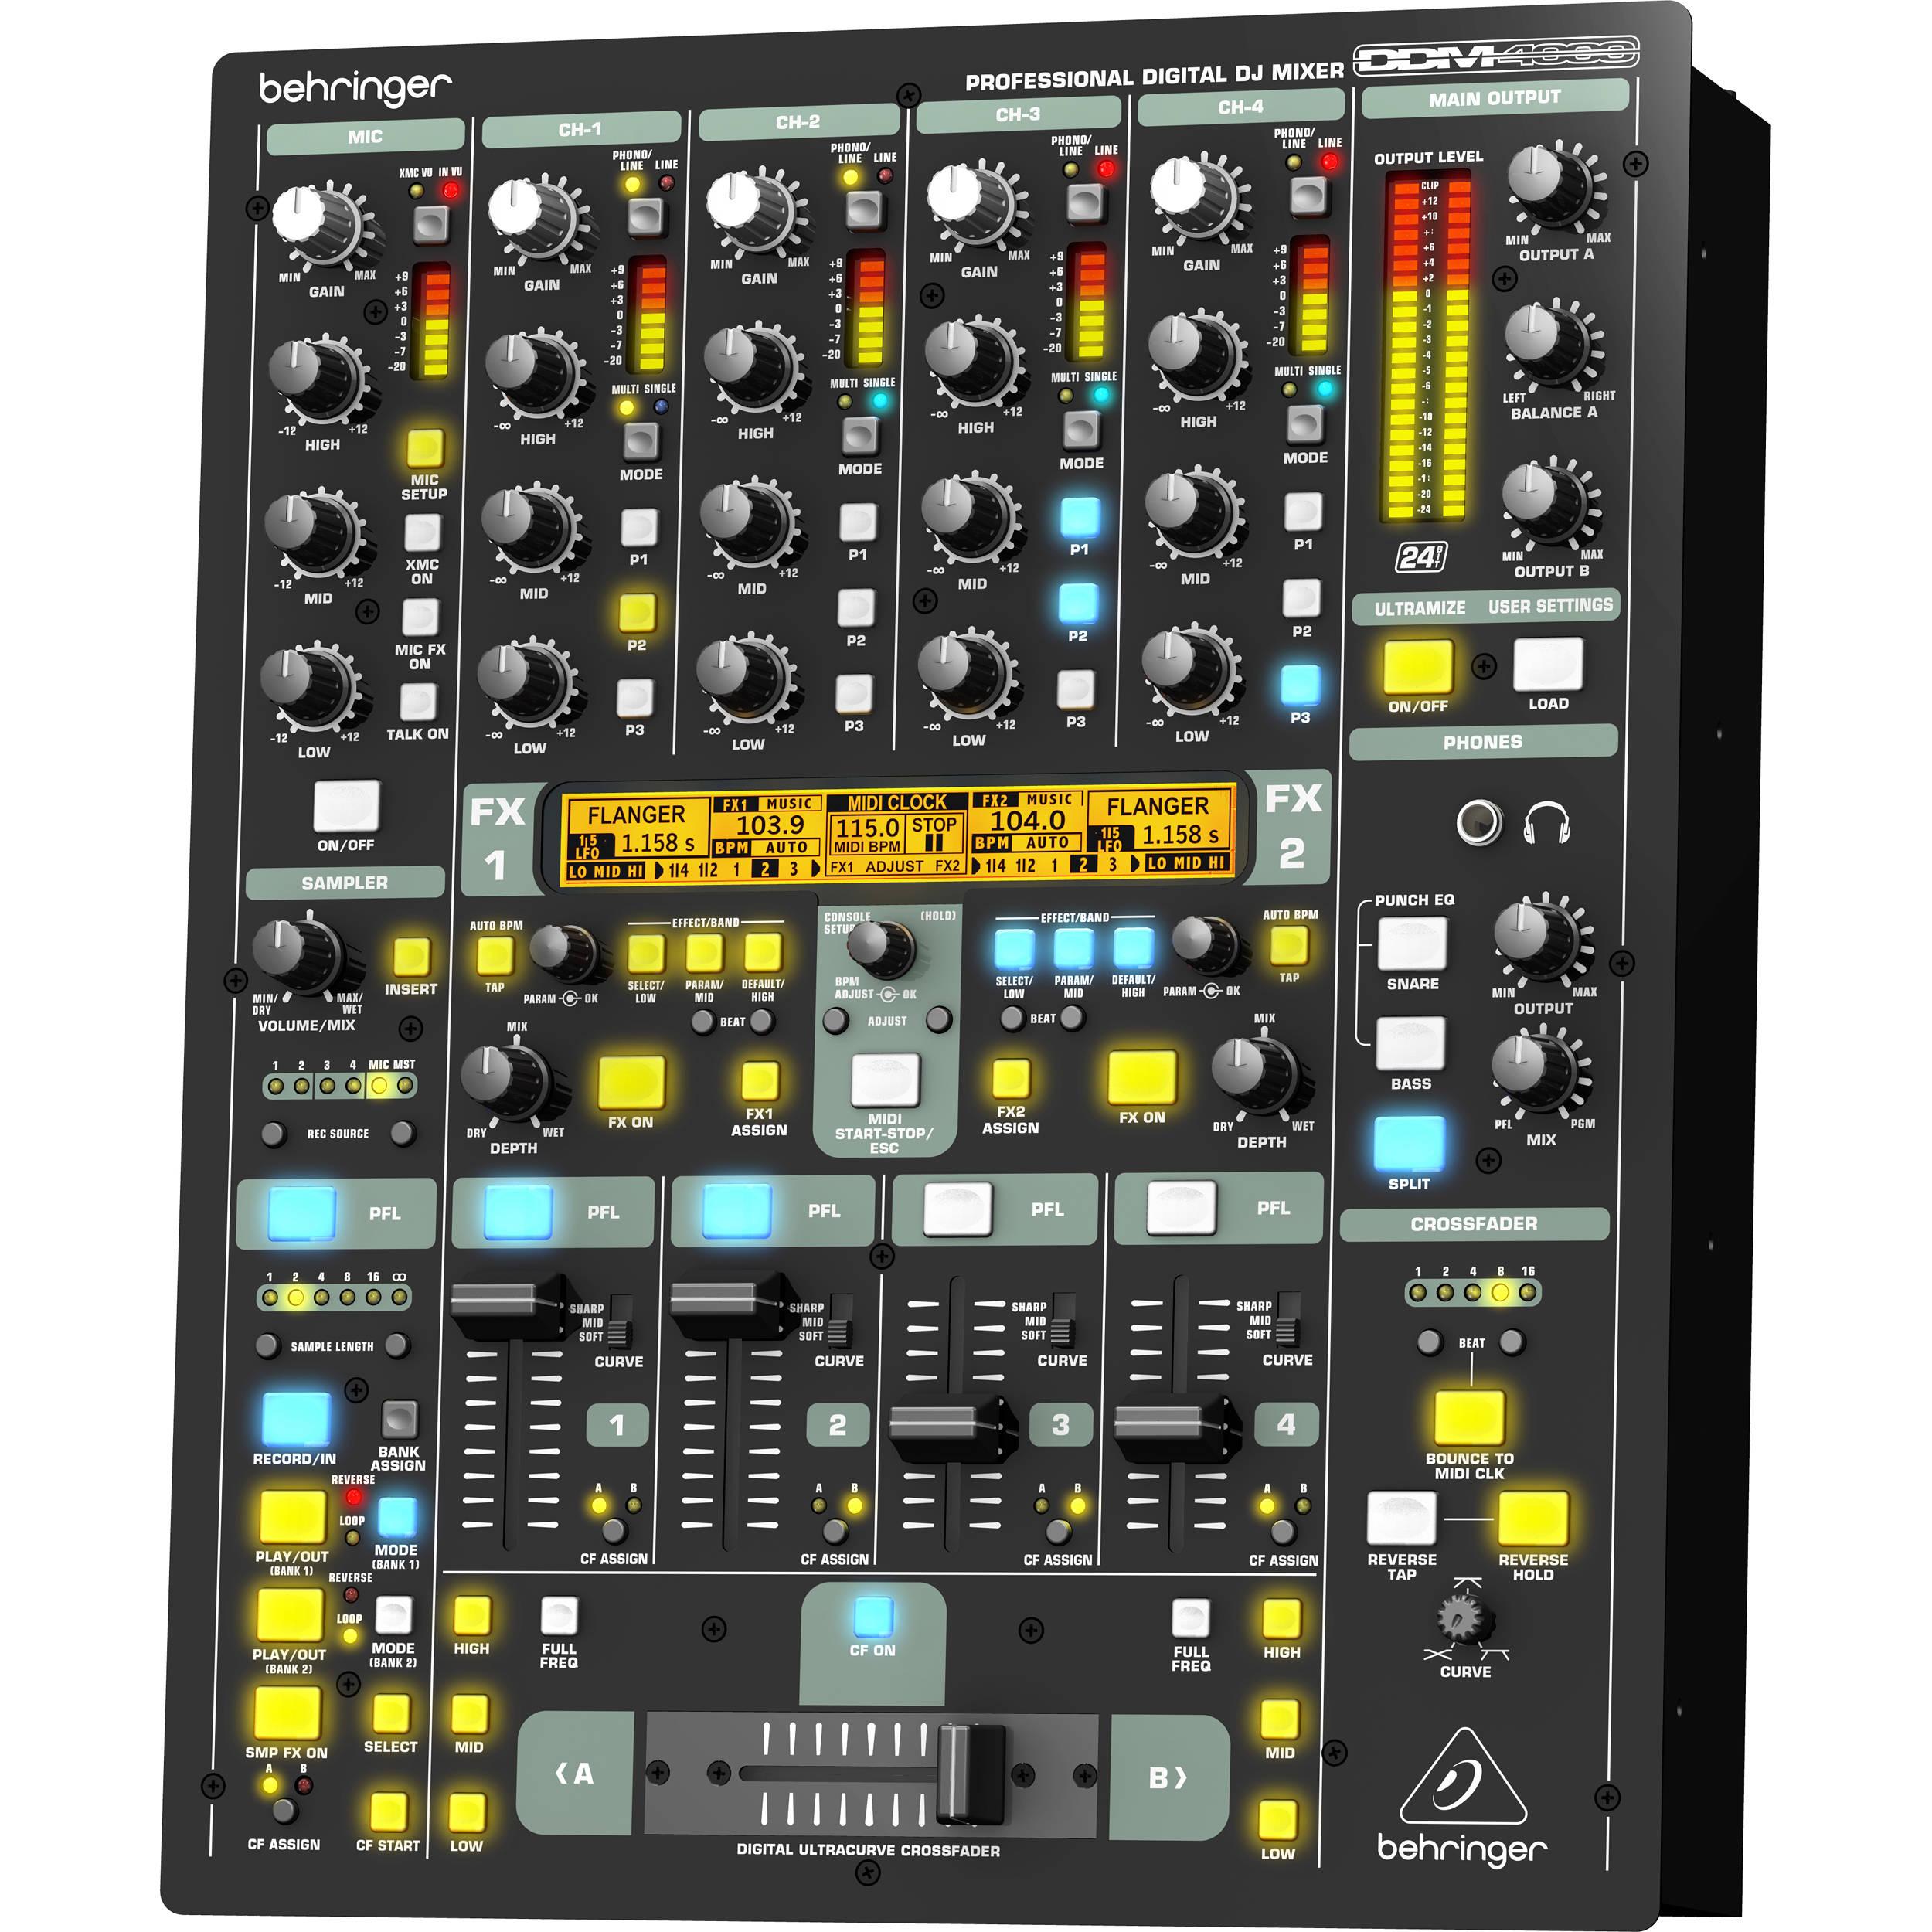 4 channel dj mixer